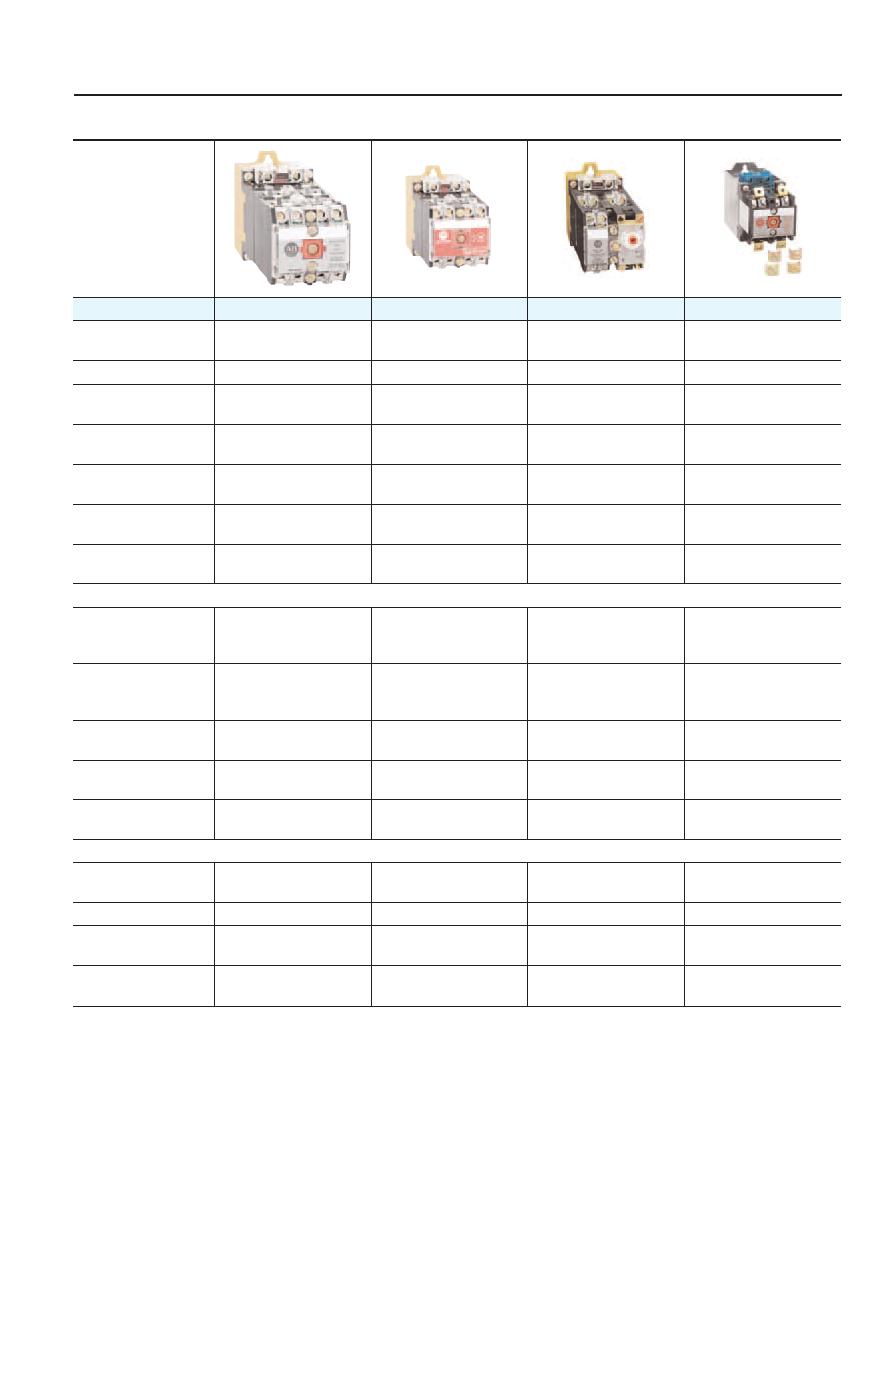 700-FE pdf, arduino